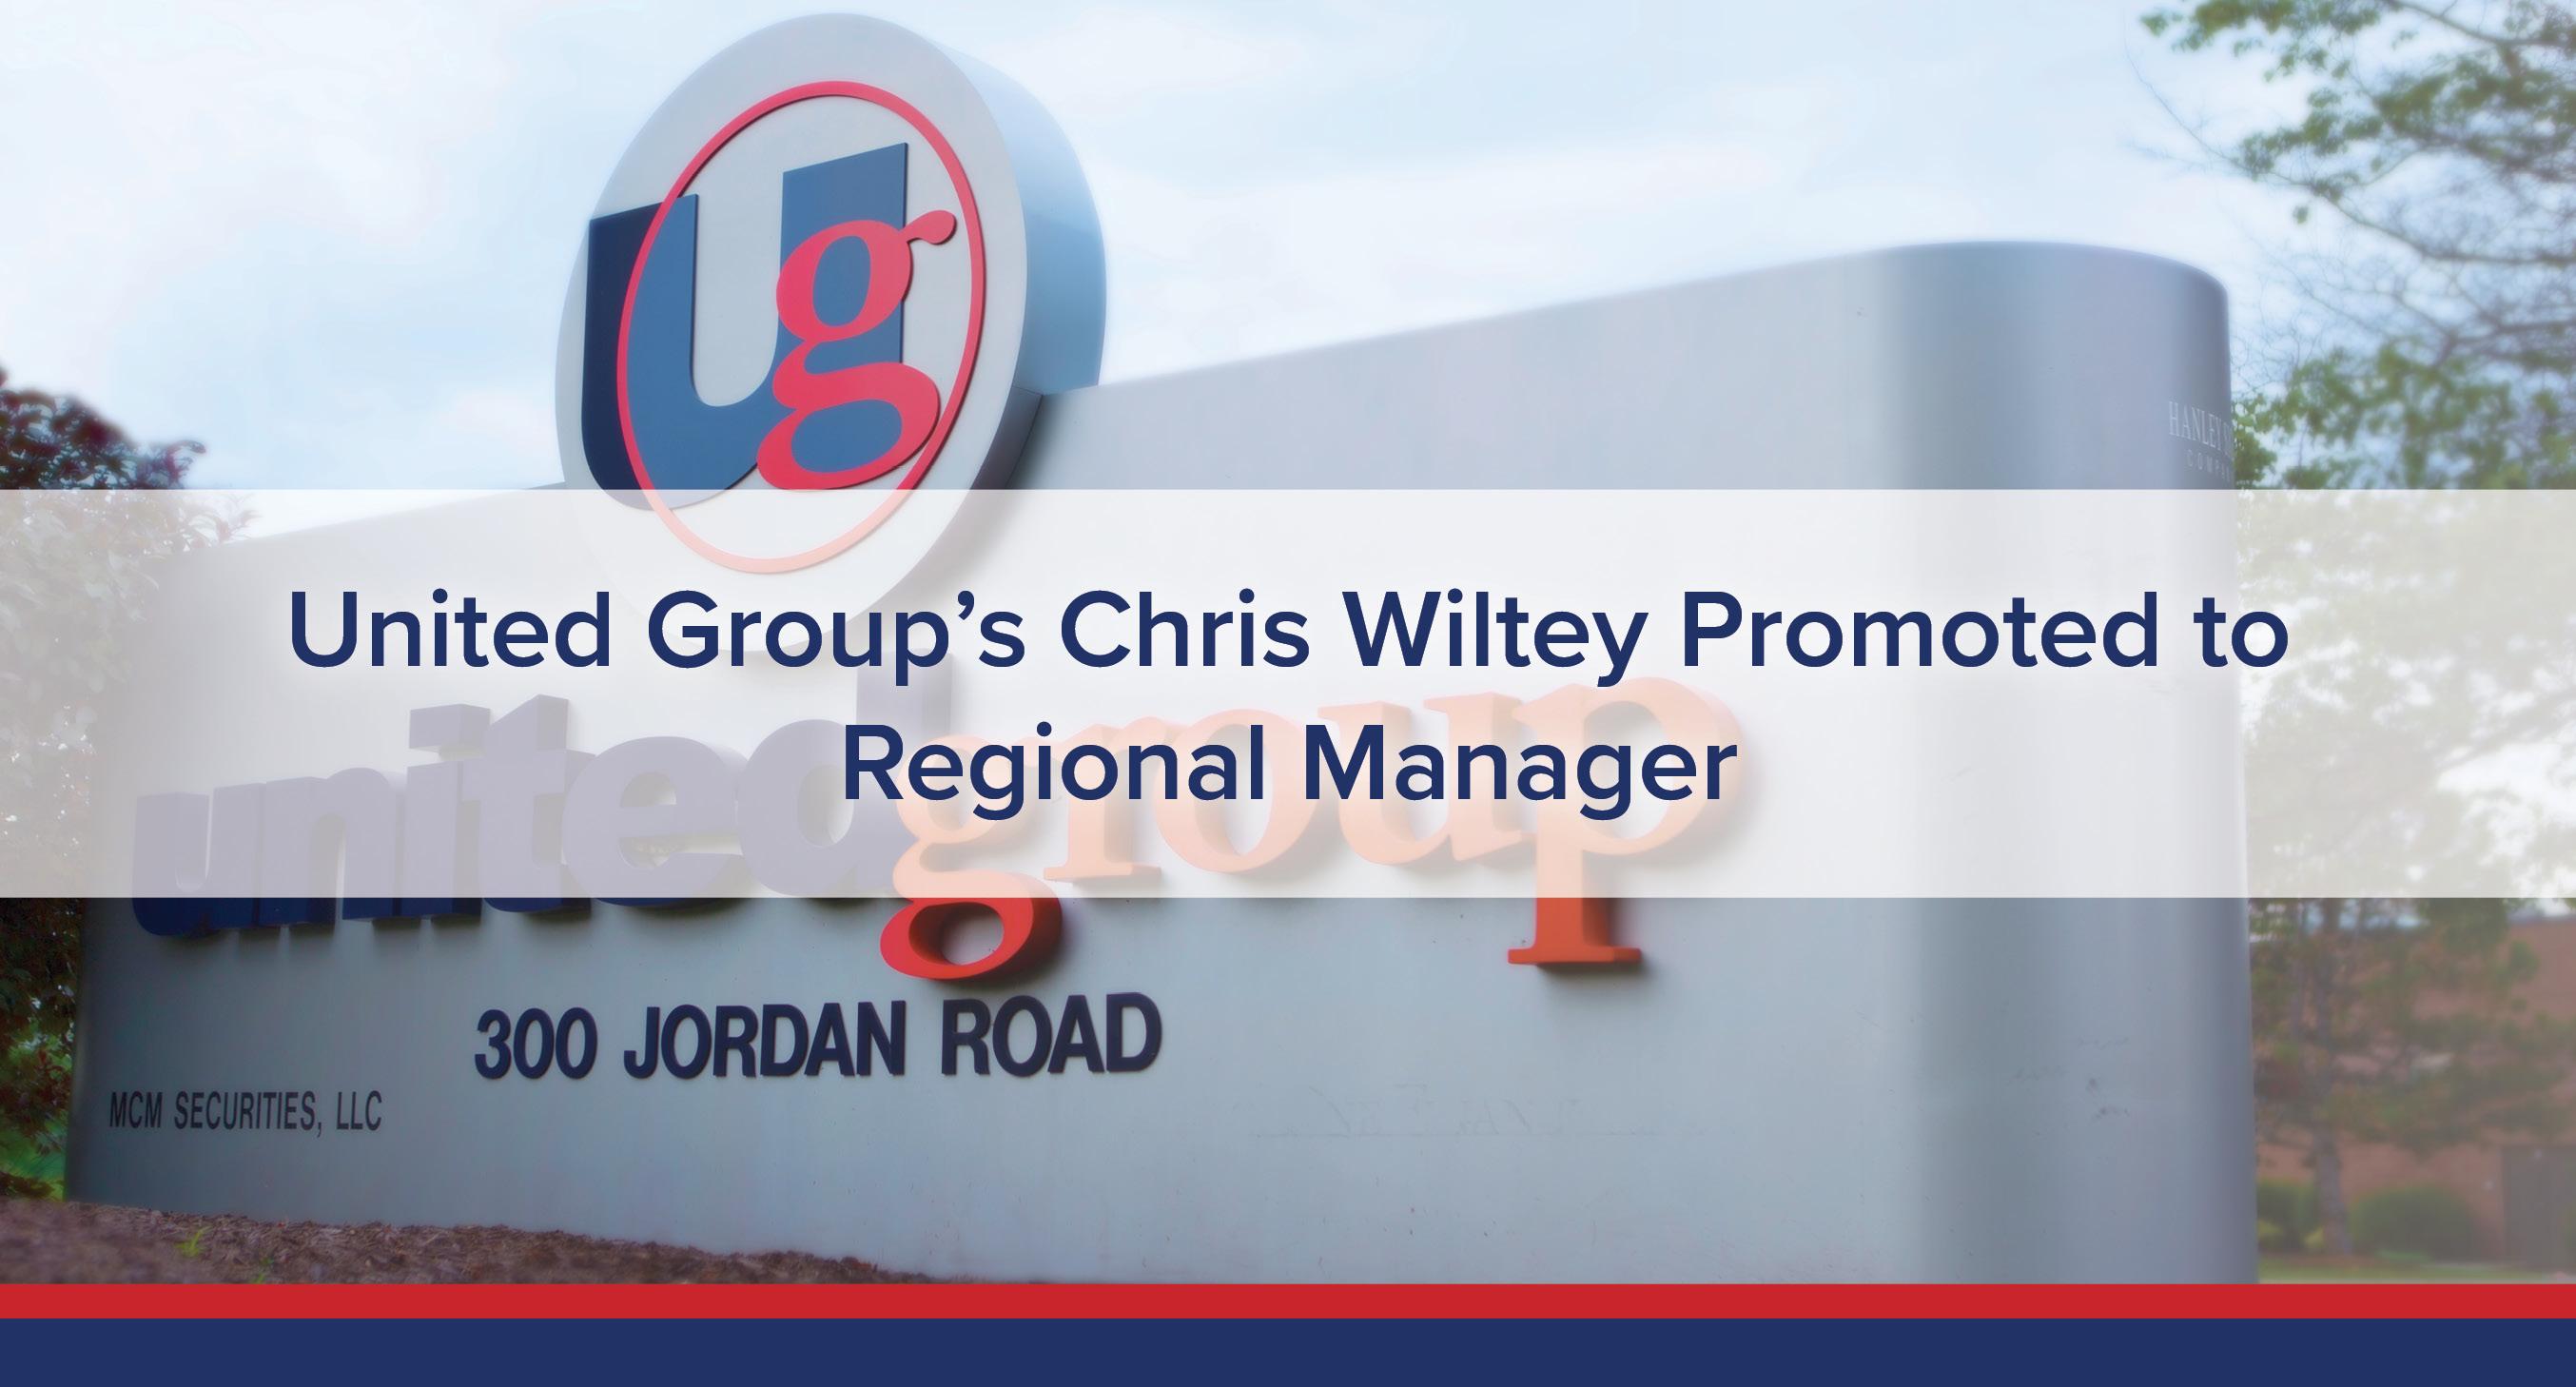 UGOC Spotlight: Chris Wiltey Promoted to Regional Manager